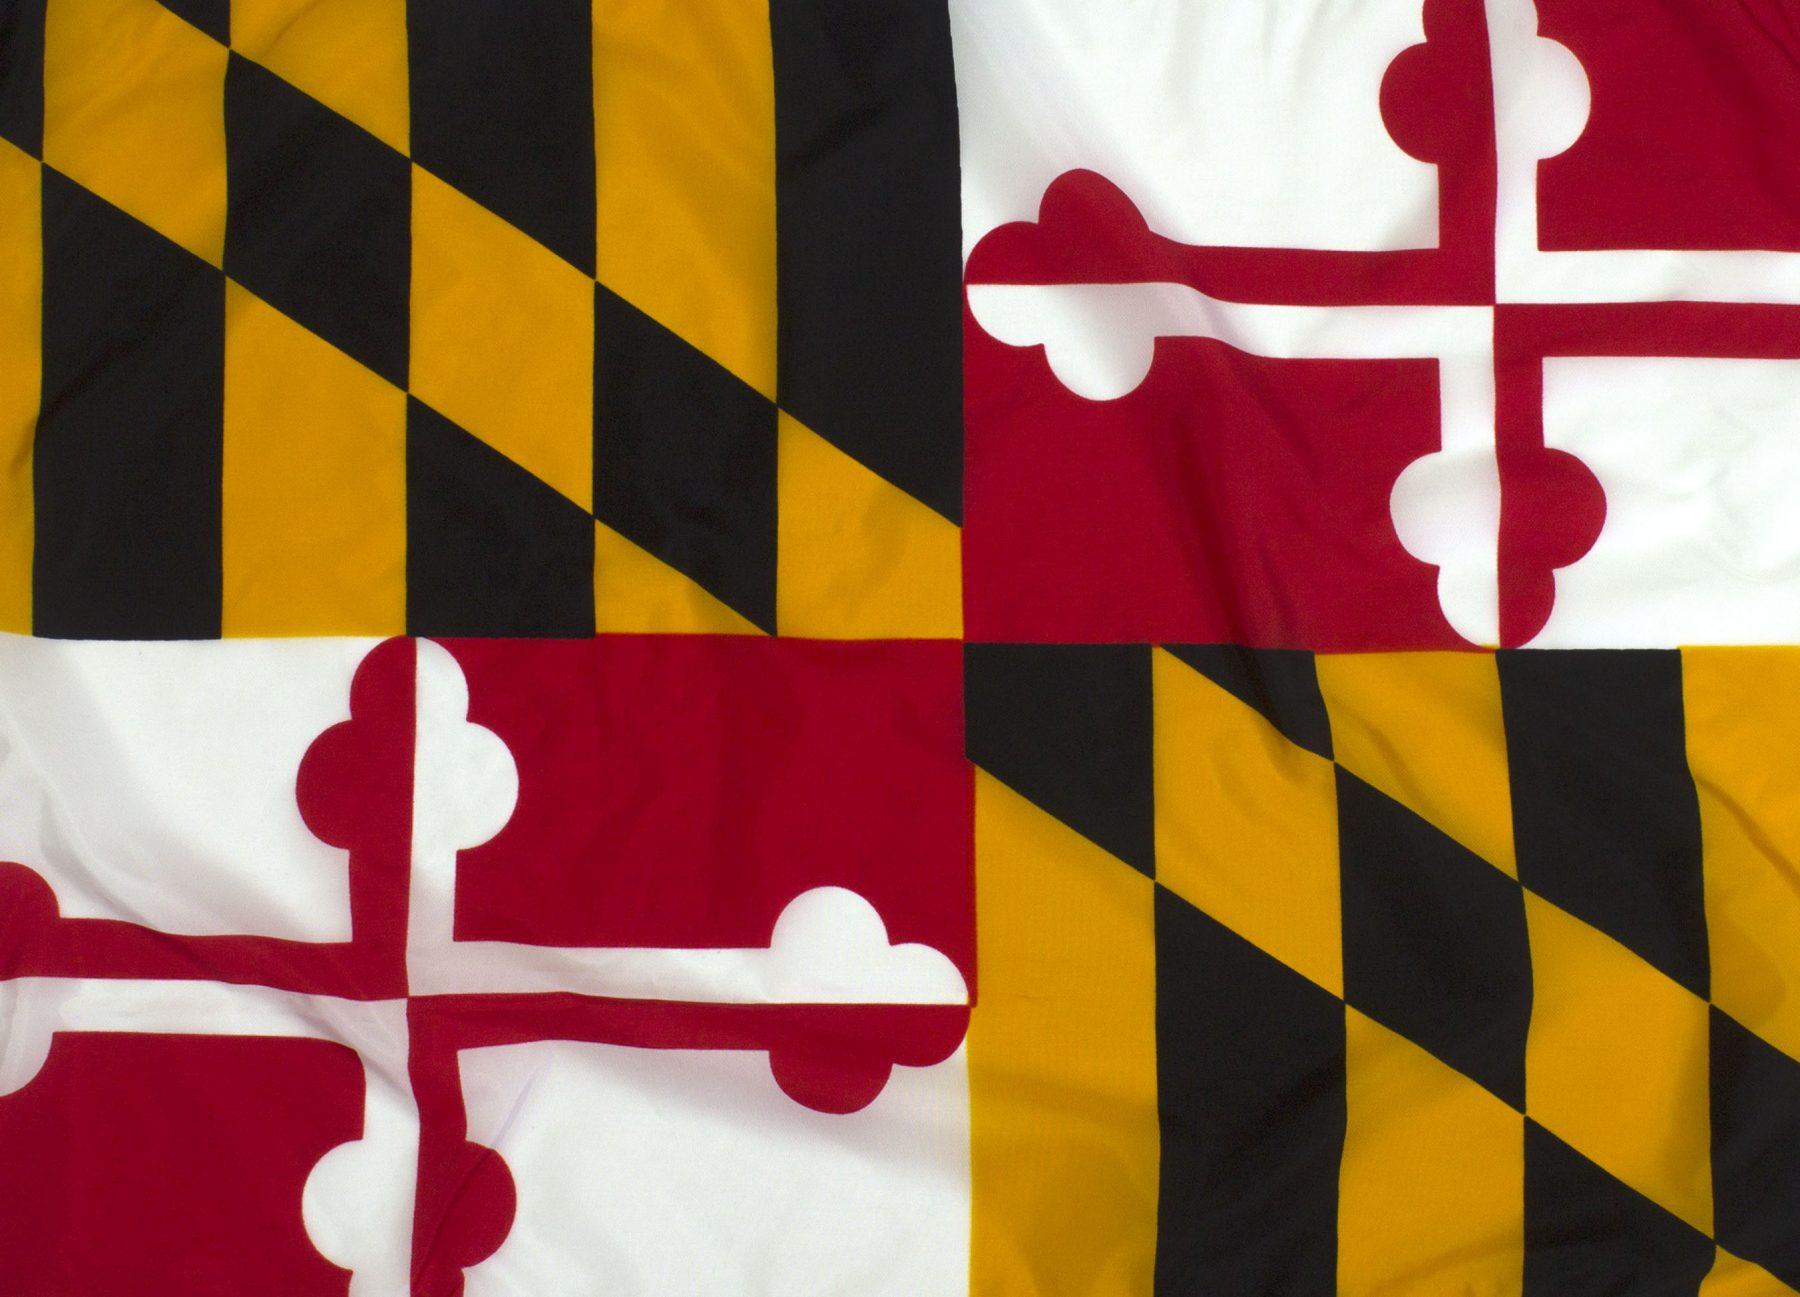 Layered-Flag-Emblems-File_0057_Maryland-flag-emblem